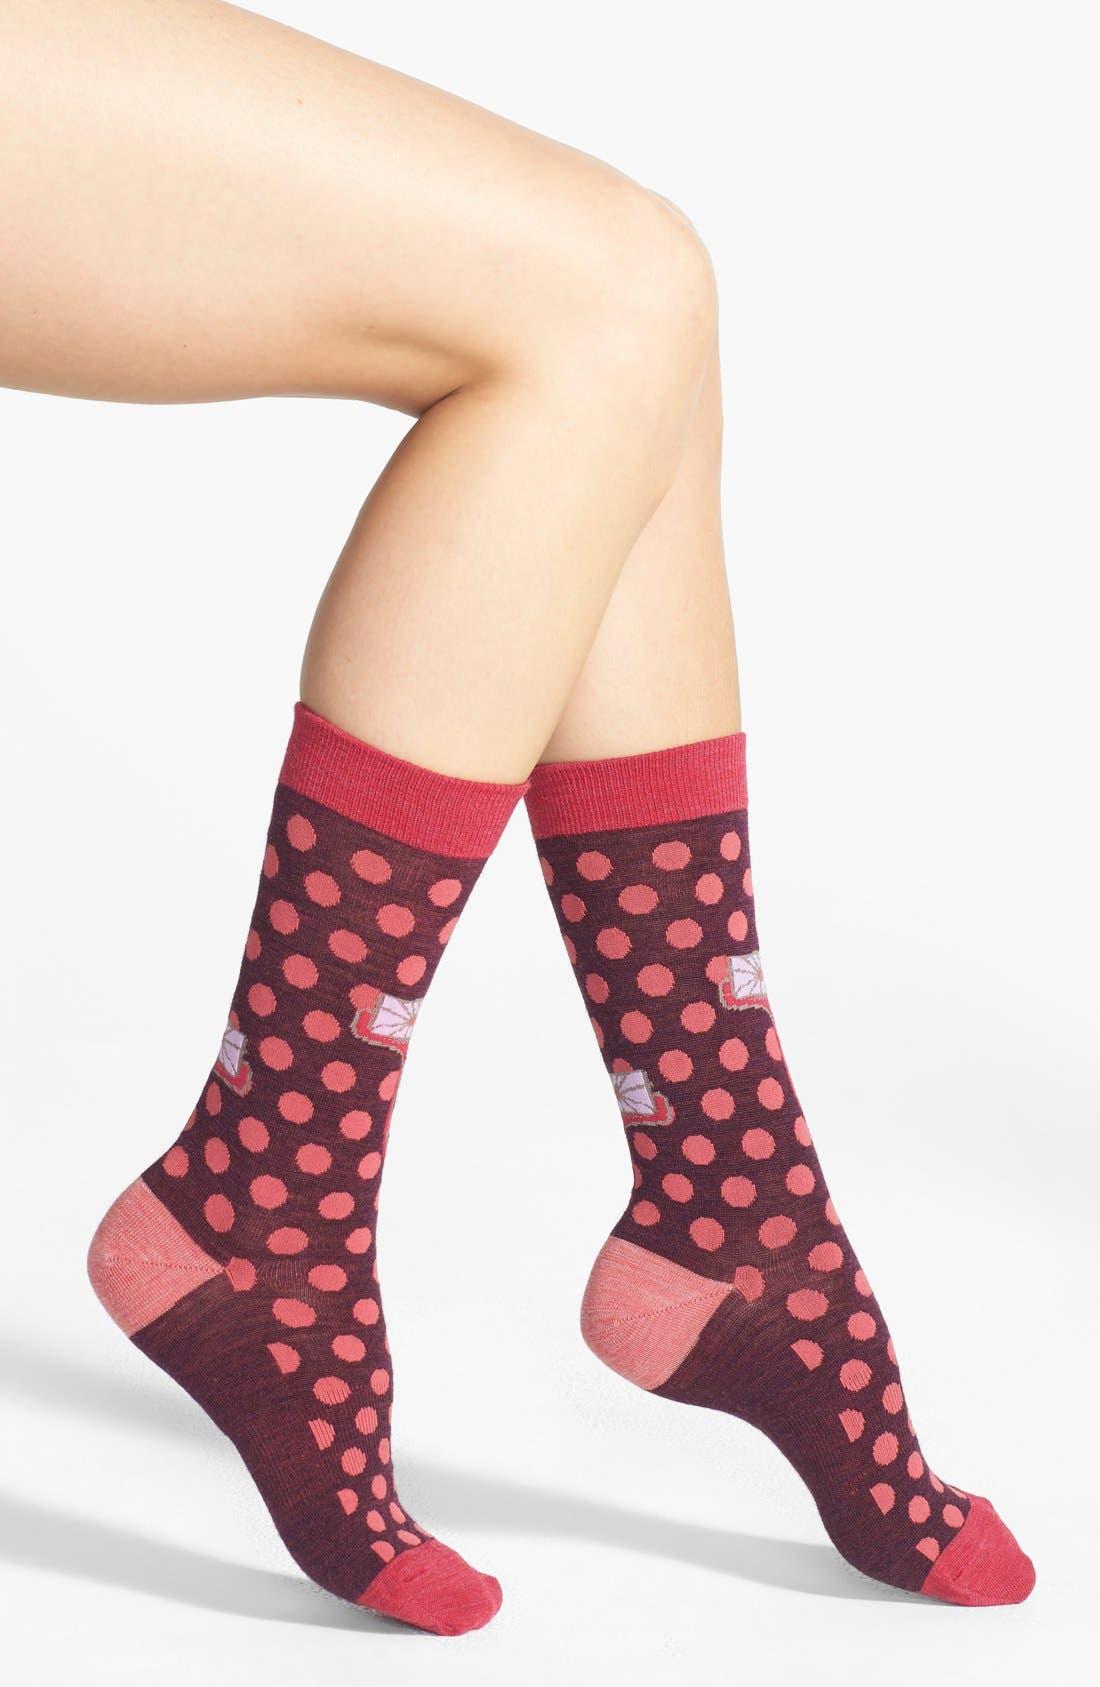 Alternate Image 1 Selected - Smartwool 'Dancing Dots' Merino Wool Blend Crew Socks